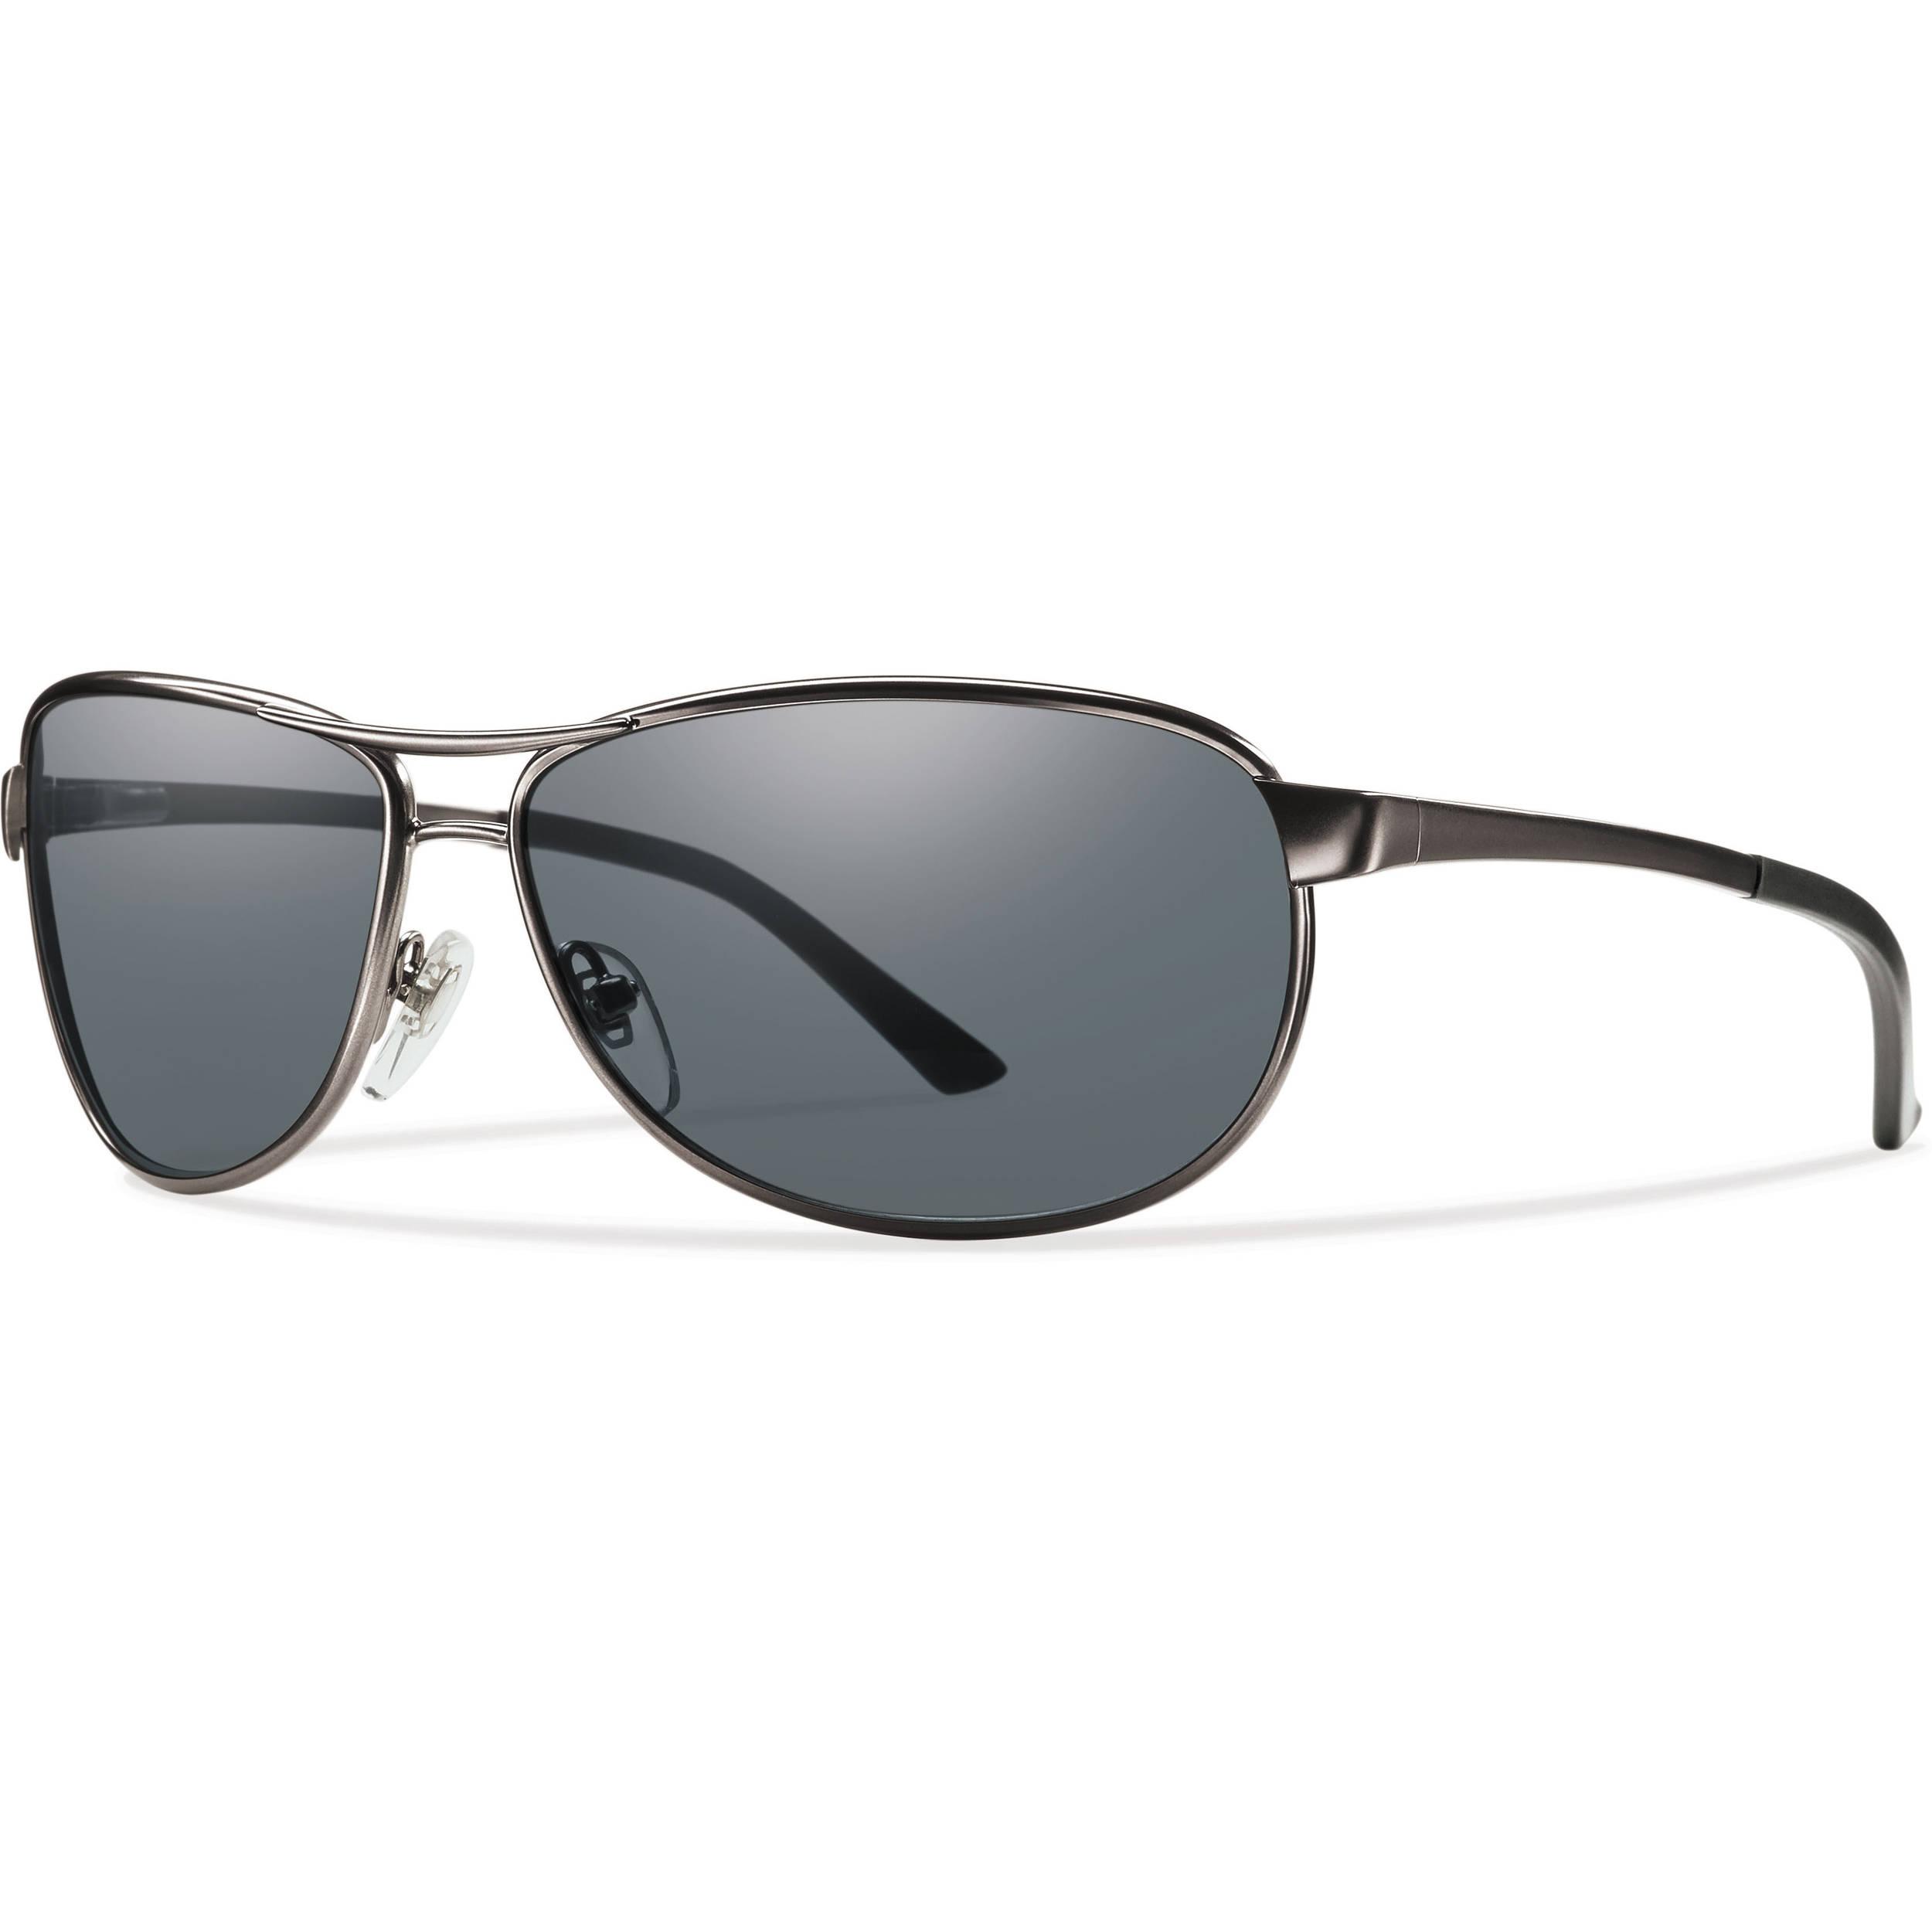 2fbd5ff2e70e Smith Optics Gray Man Elite Tactical Sunglasses GMTPCGYGM2 on PopScreen